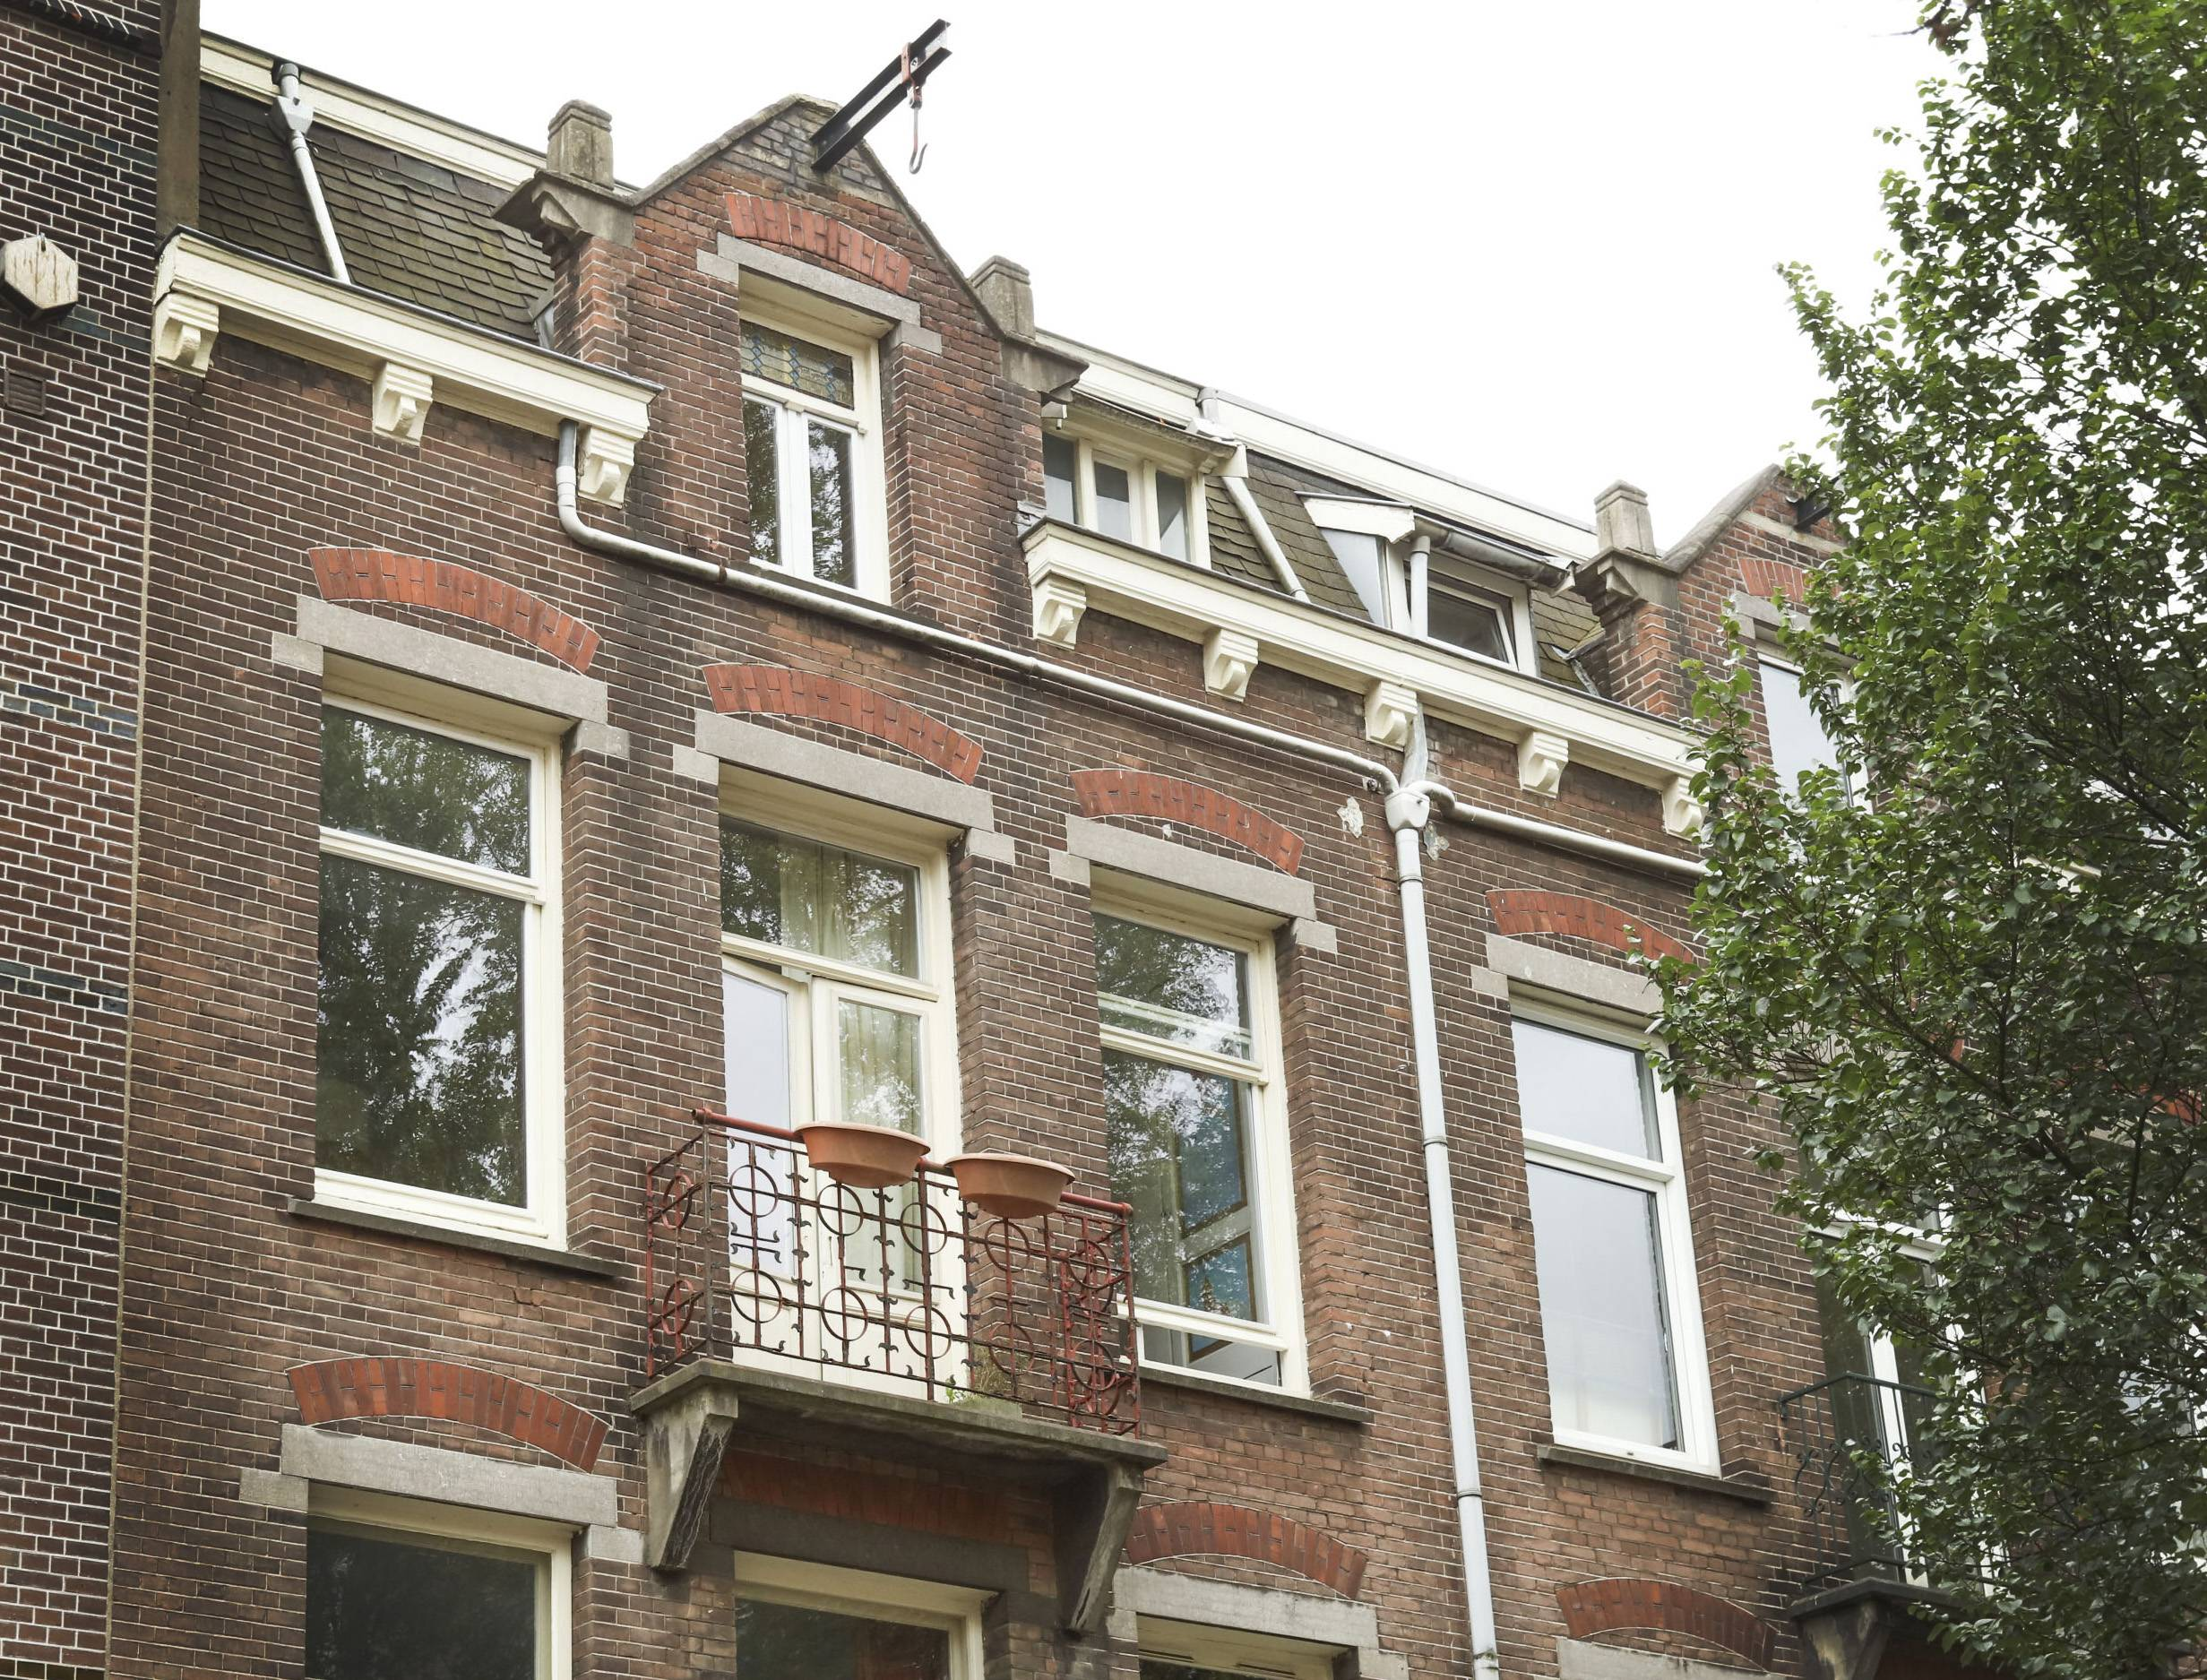 Amsterdam, Frans van Mierisstraat